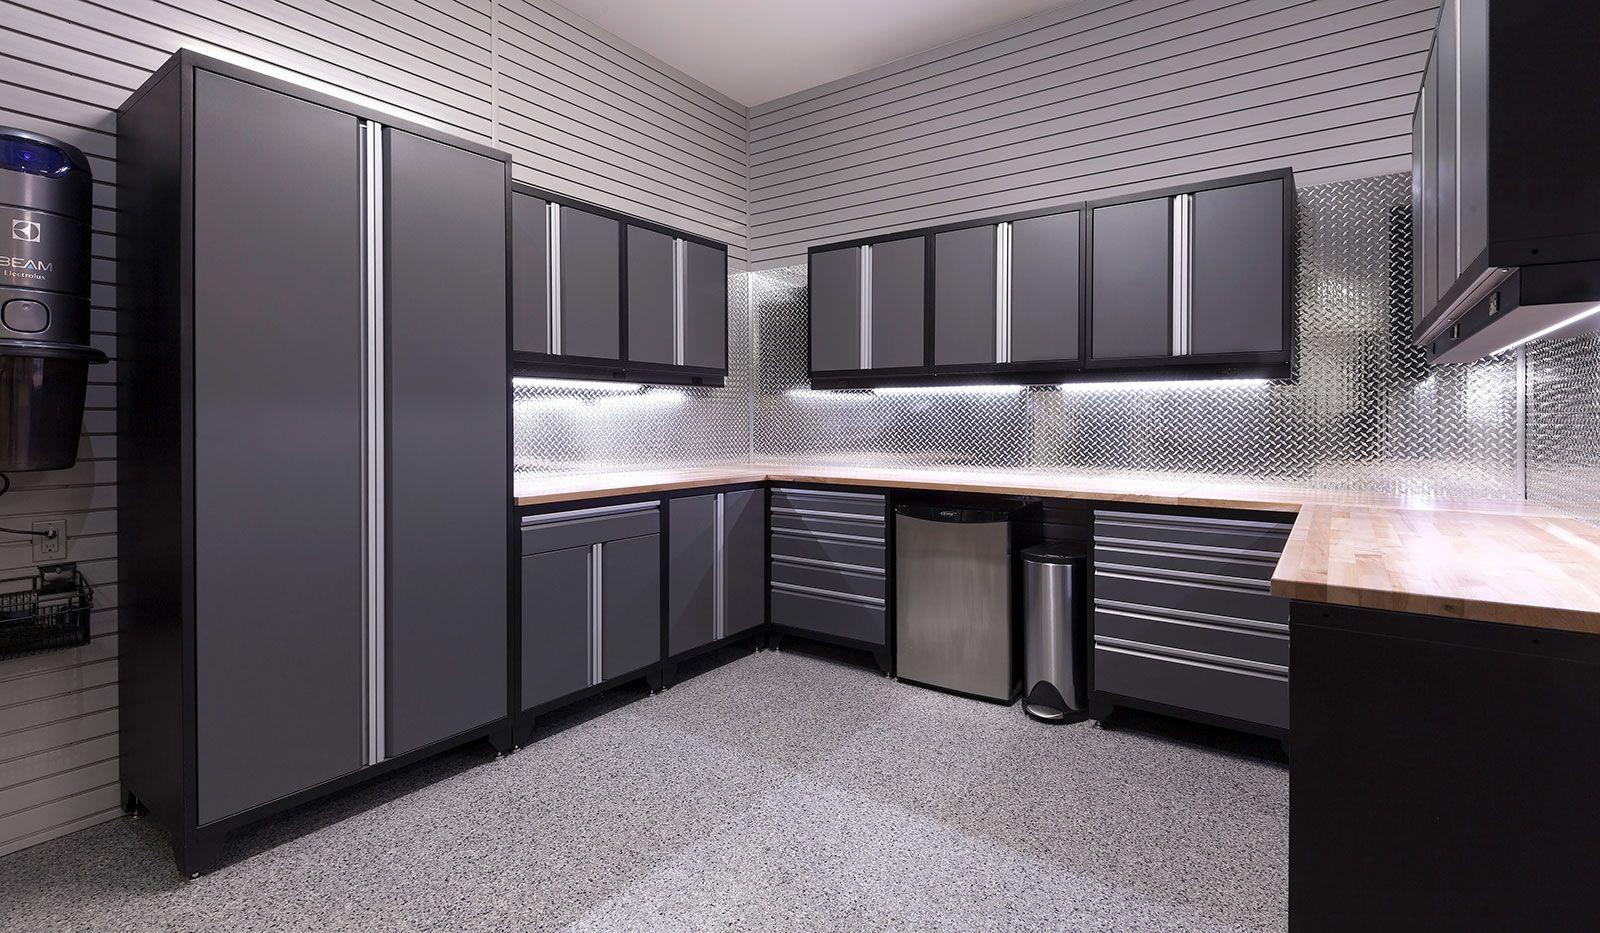 Gl Signature Cabinets Garage Cabinet